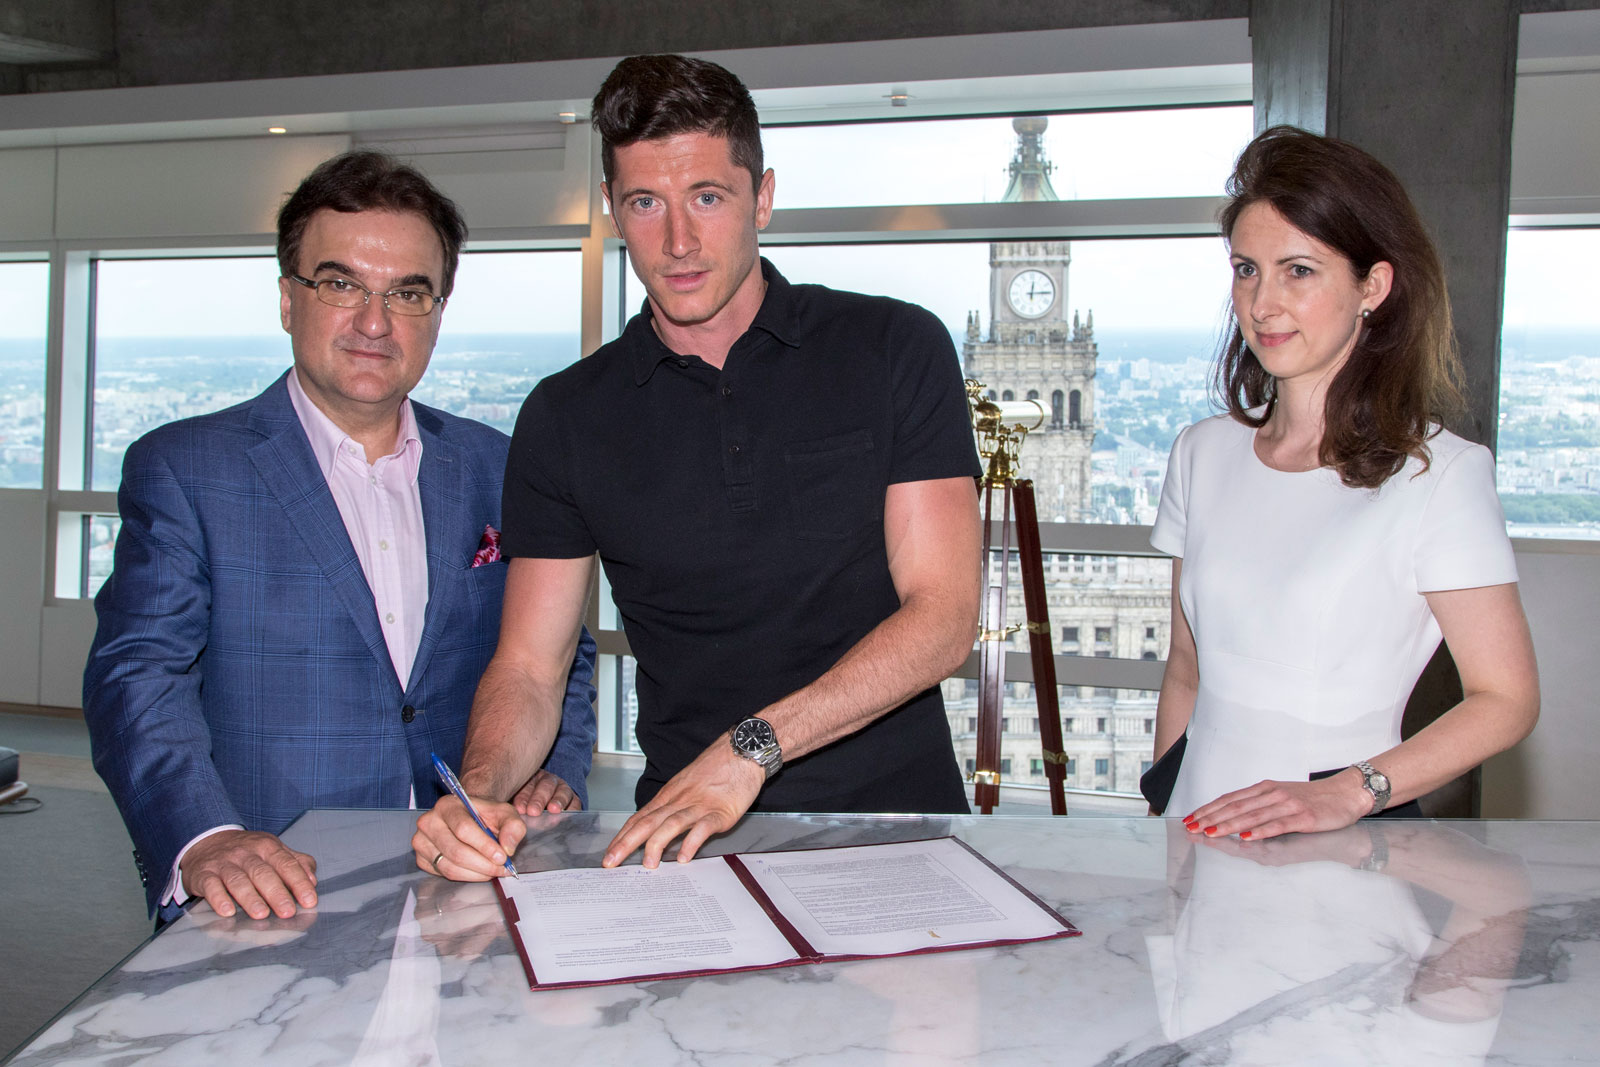 Robert Lewandowski signing the contract for his Zlota 44 apartment